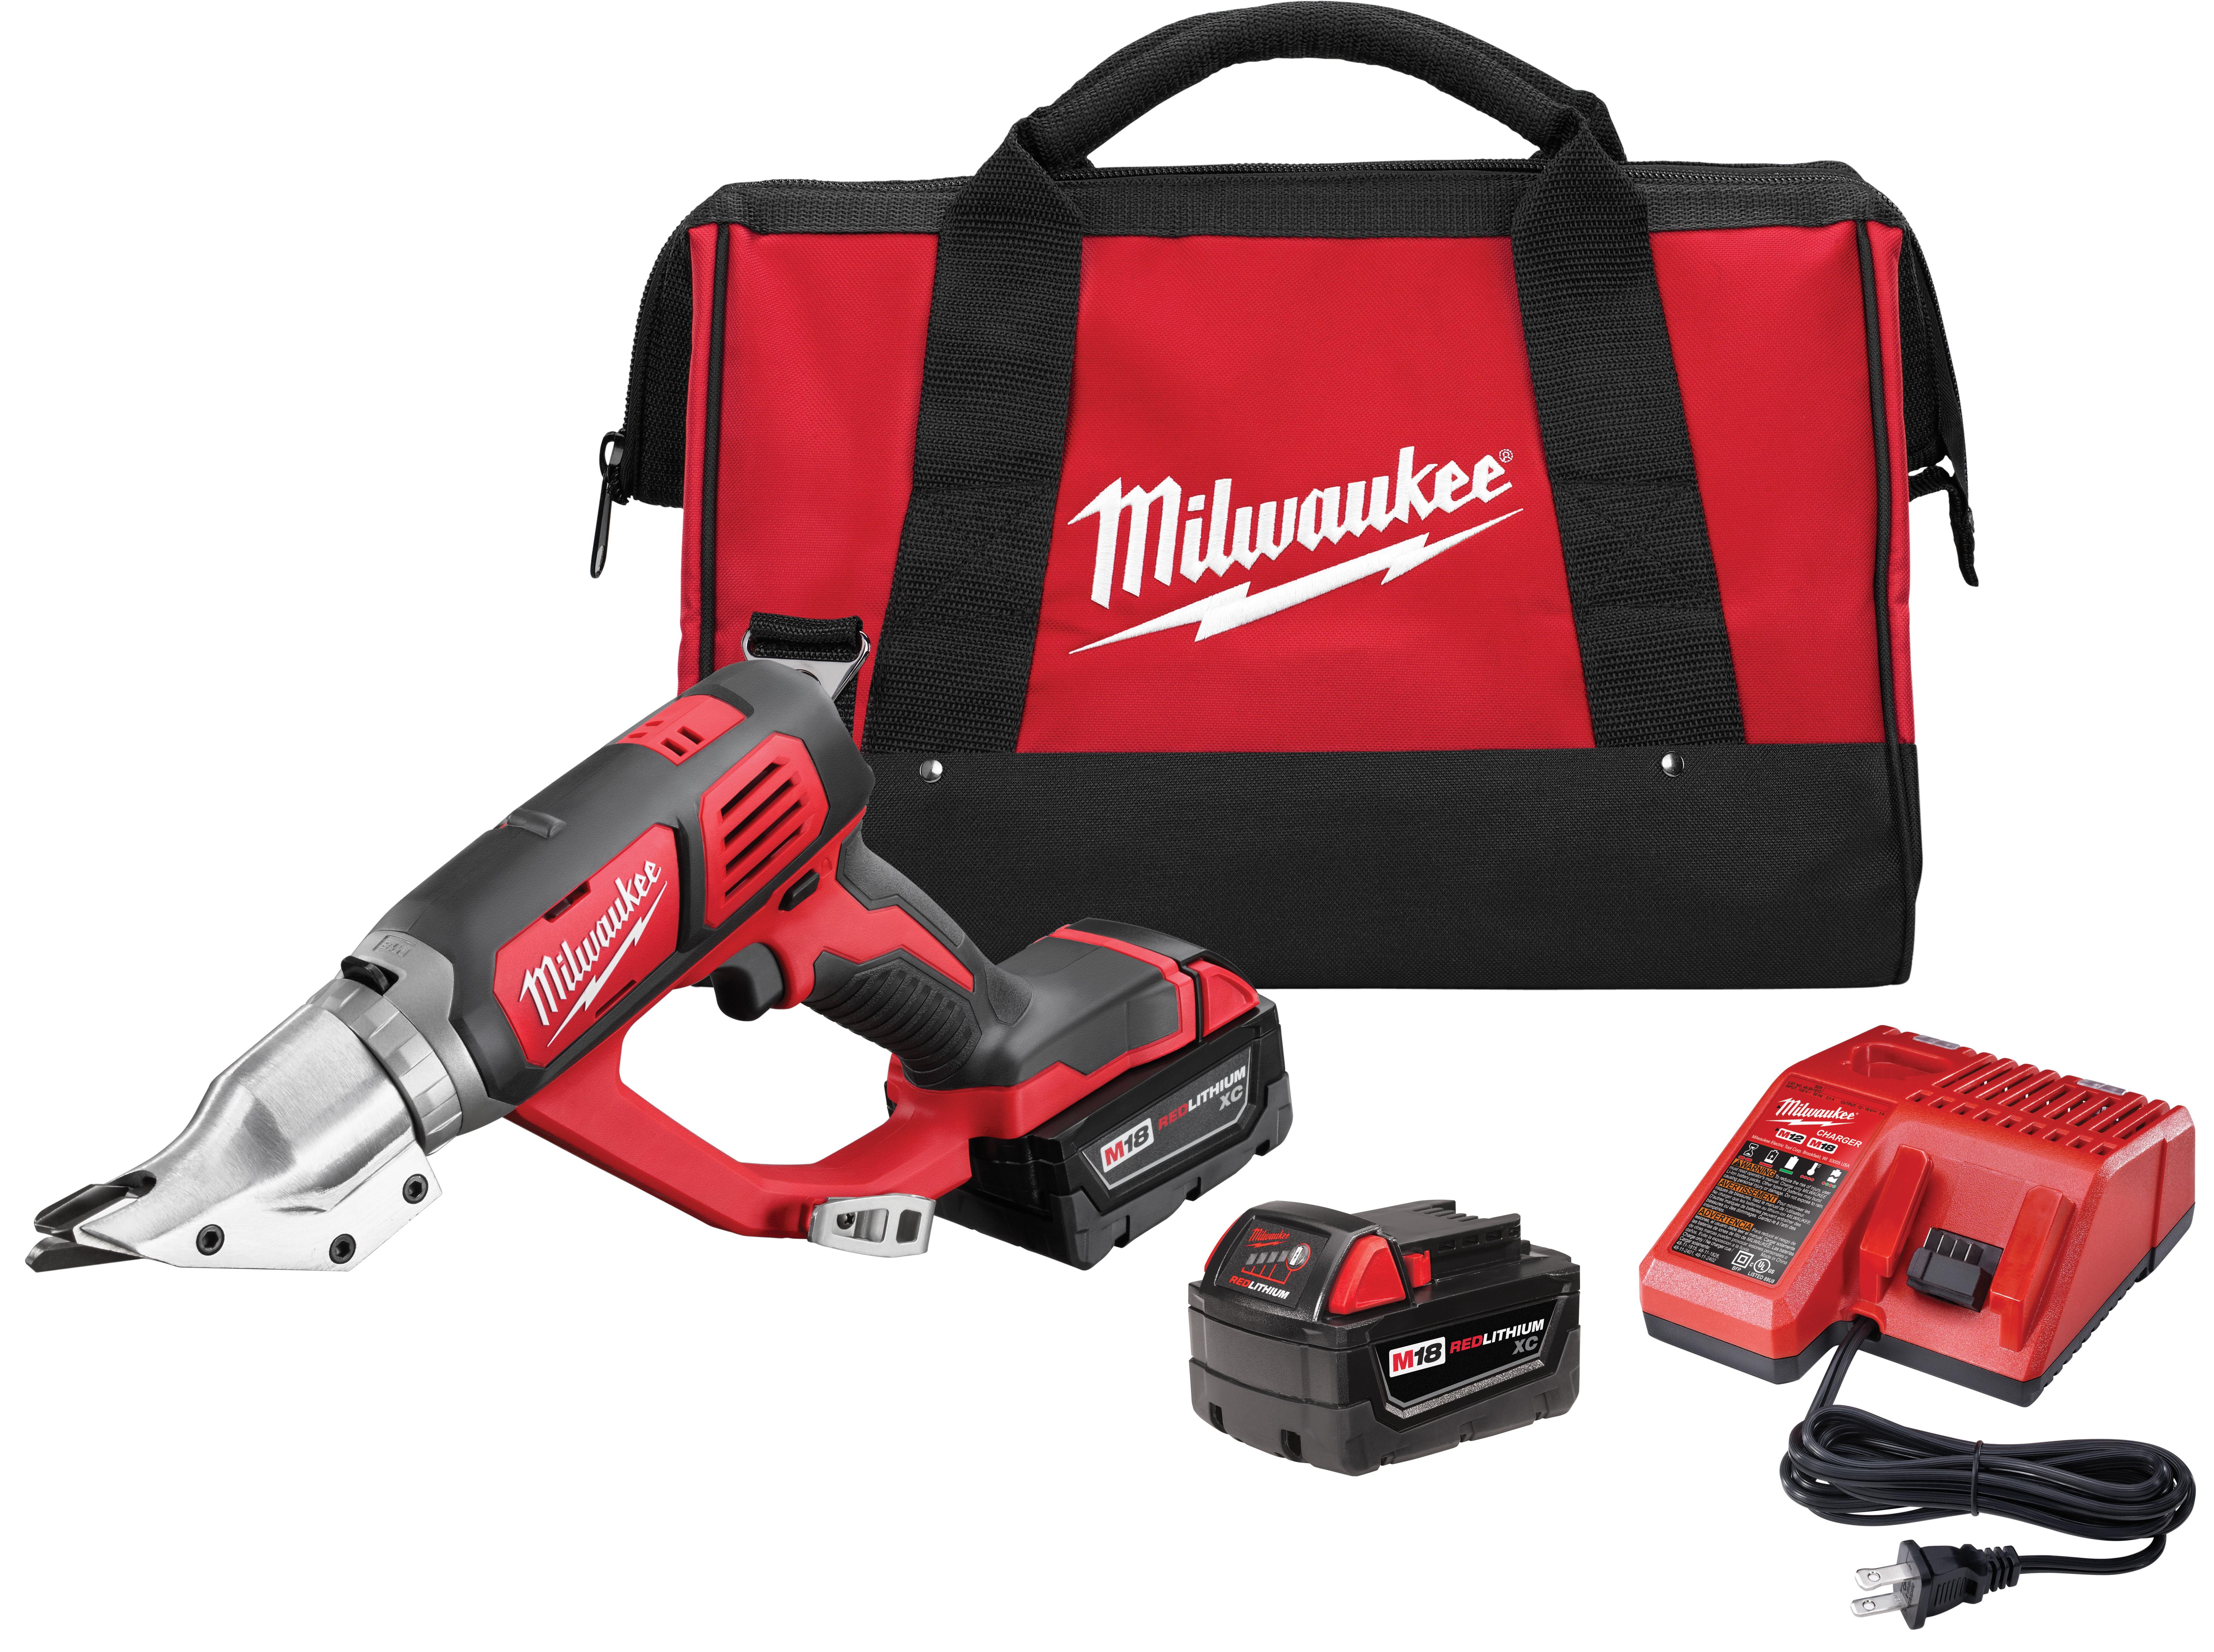 Milwaukee 2635-22 M18™ Cordless 18 Gauge Double Cut Shear Kit